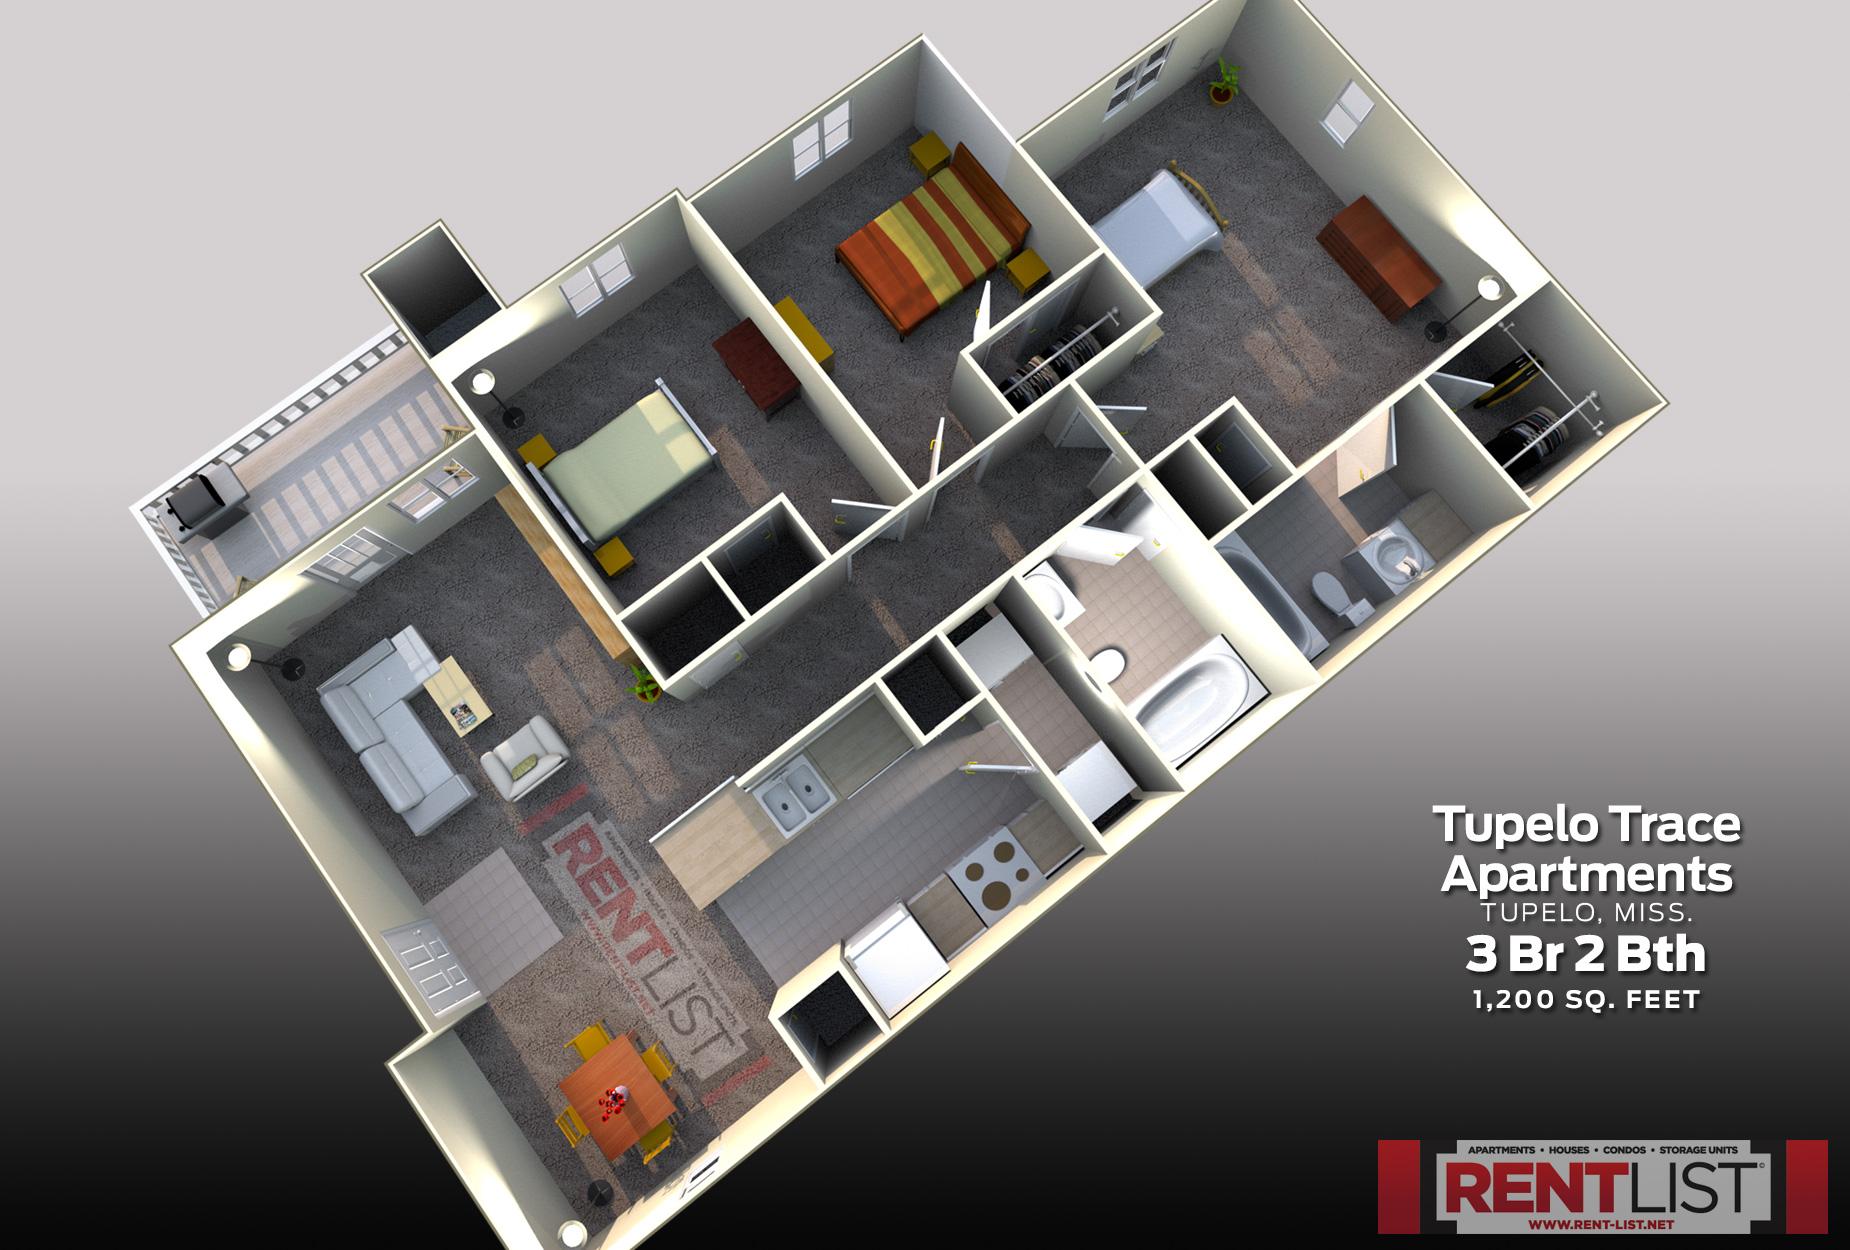 Plan house printing tupelo ms house plans Building plan printing